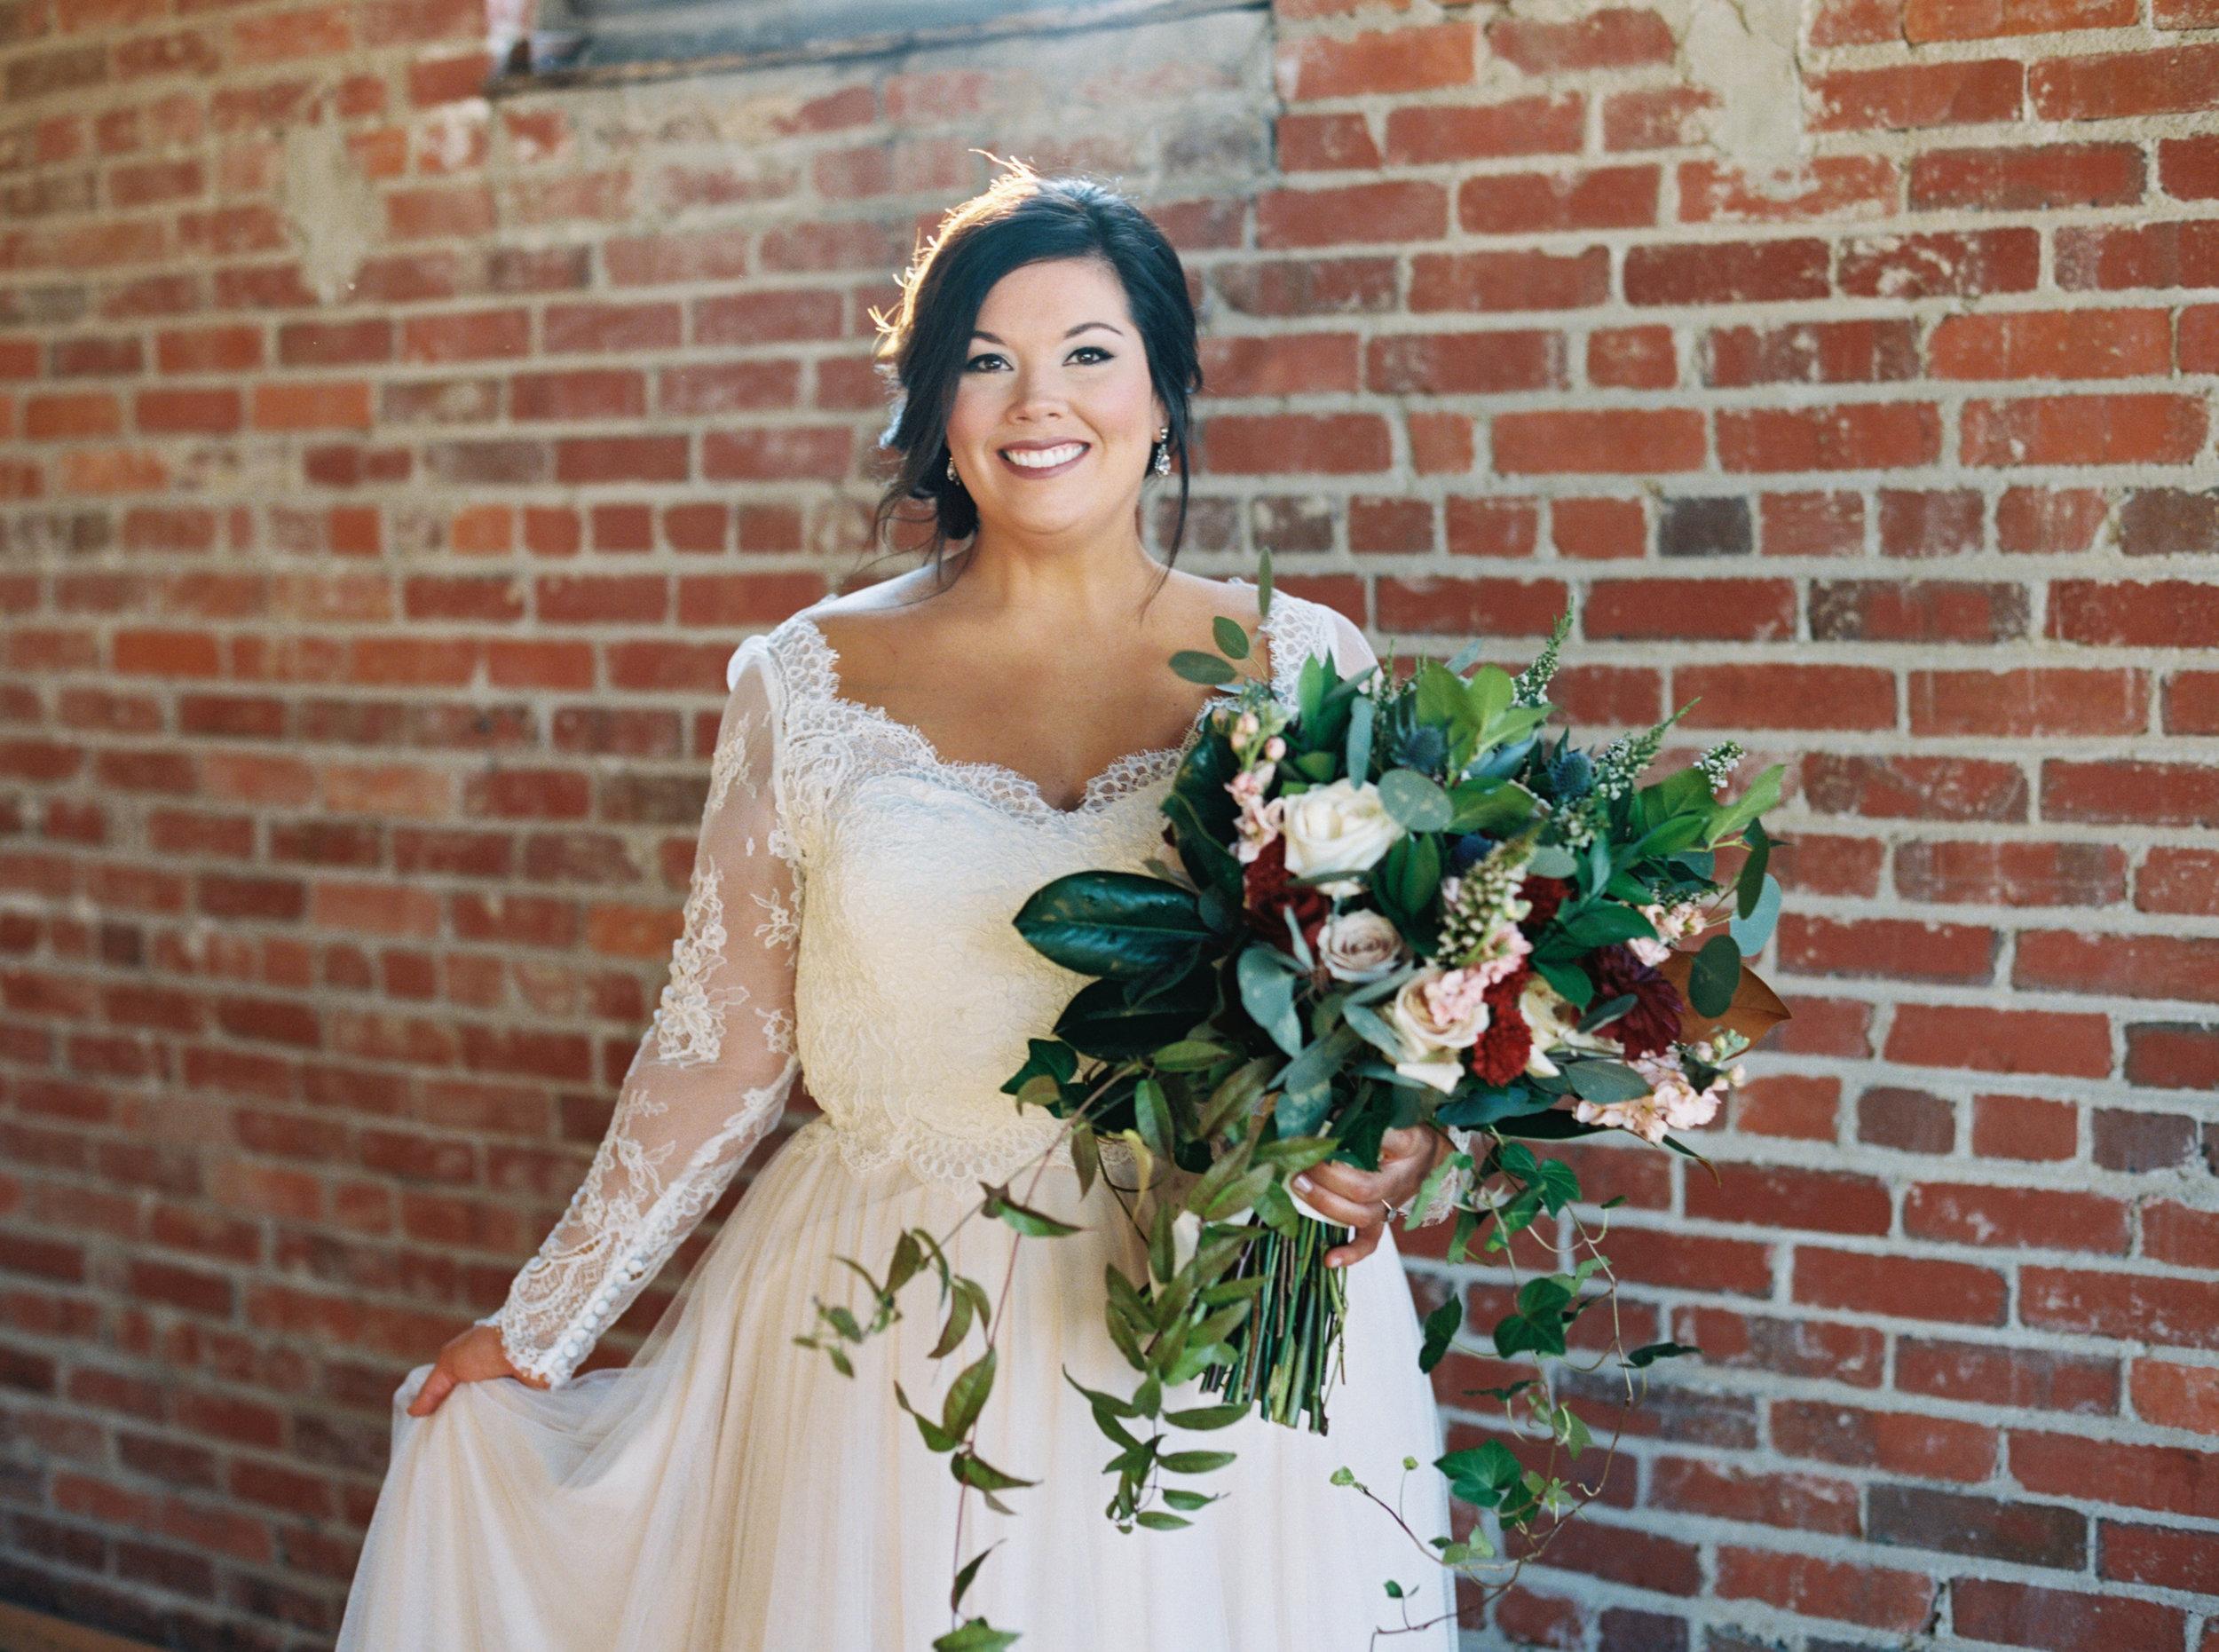 Lauren_Jeremy_Standard_Wedding_Knoxville_Abigail_Malone_Photography_FIlm-113.jpg